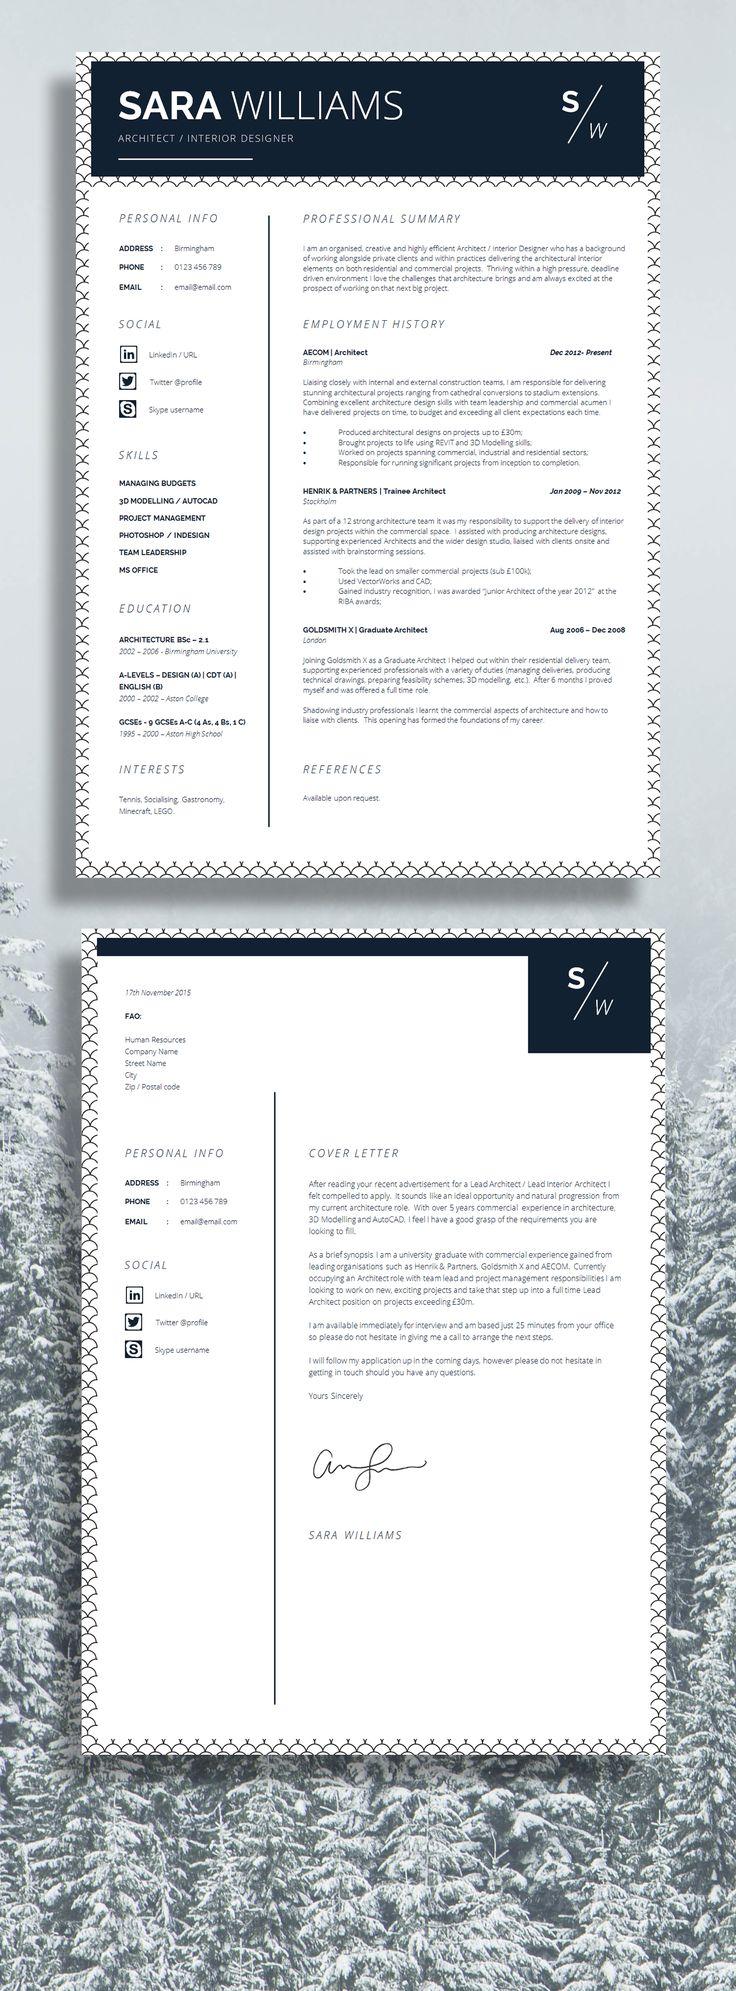 Sara Williams Architect CV / Resume - A Professional Approach / #Resume